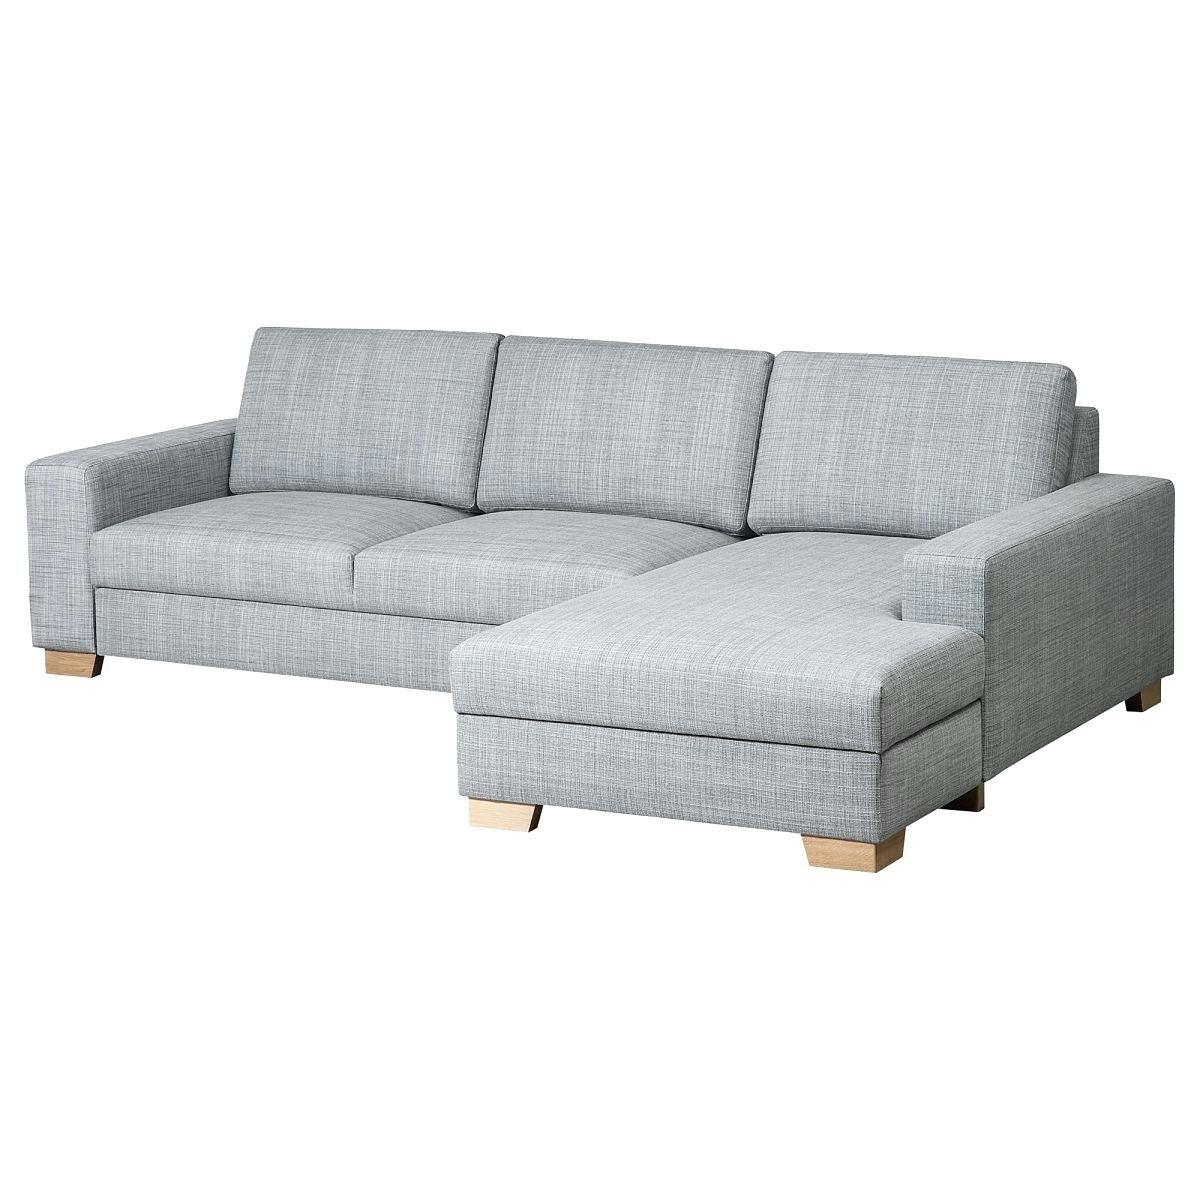 Konzept 45 Fur Sofa Fur Balkon Sofa Furniture Couch Sofa